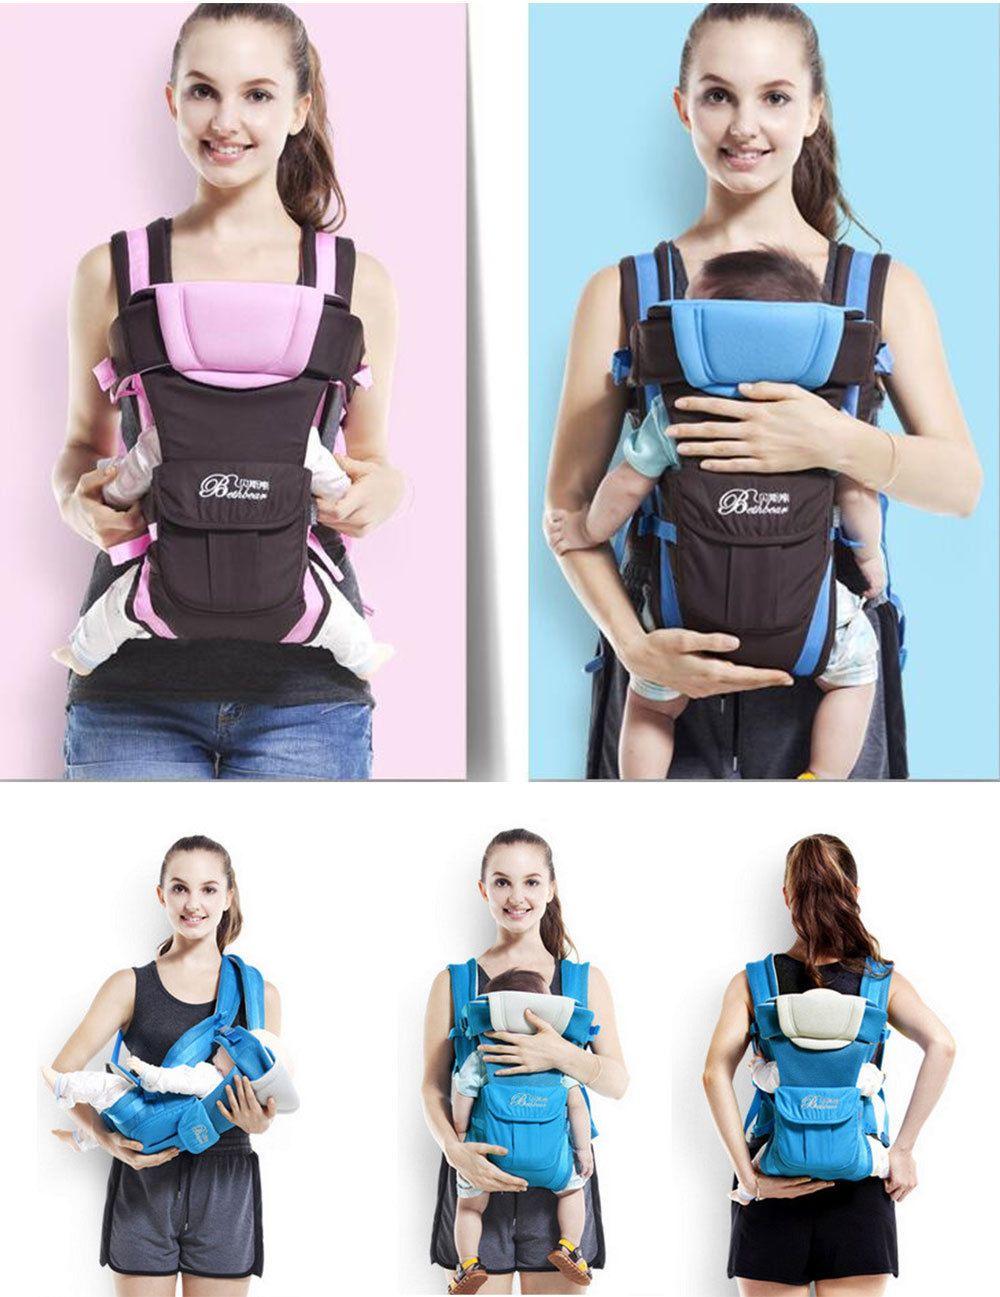 73b0ba16103  19.99 AUD - Bethbear Multipurpose Adjustable Buckle Mesh Wrap Baby Carrier  Backpack For Baby  ebay  Home   Garden